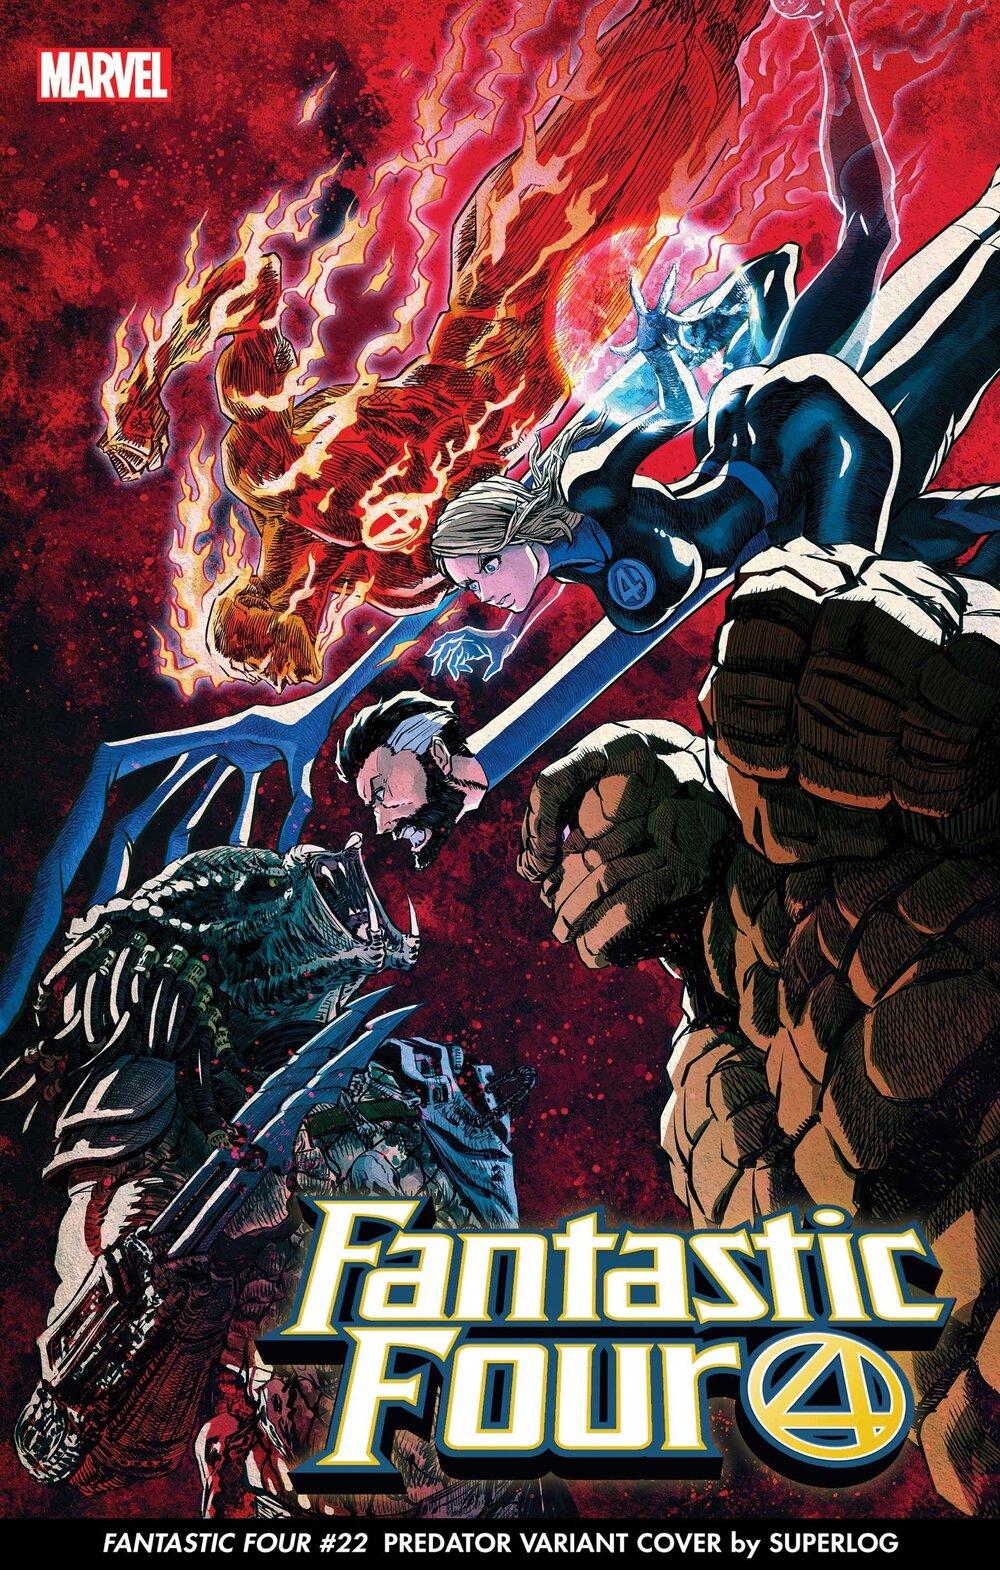 FANTASTIC FOUR #32 PREDATOR VARIANT COVER by SUPERLOG